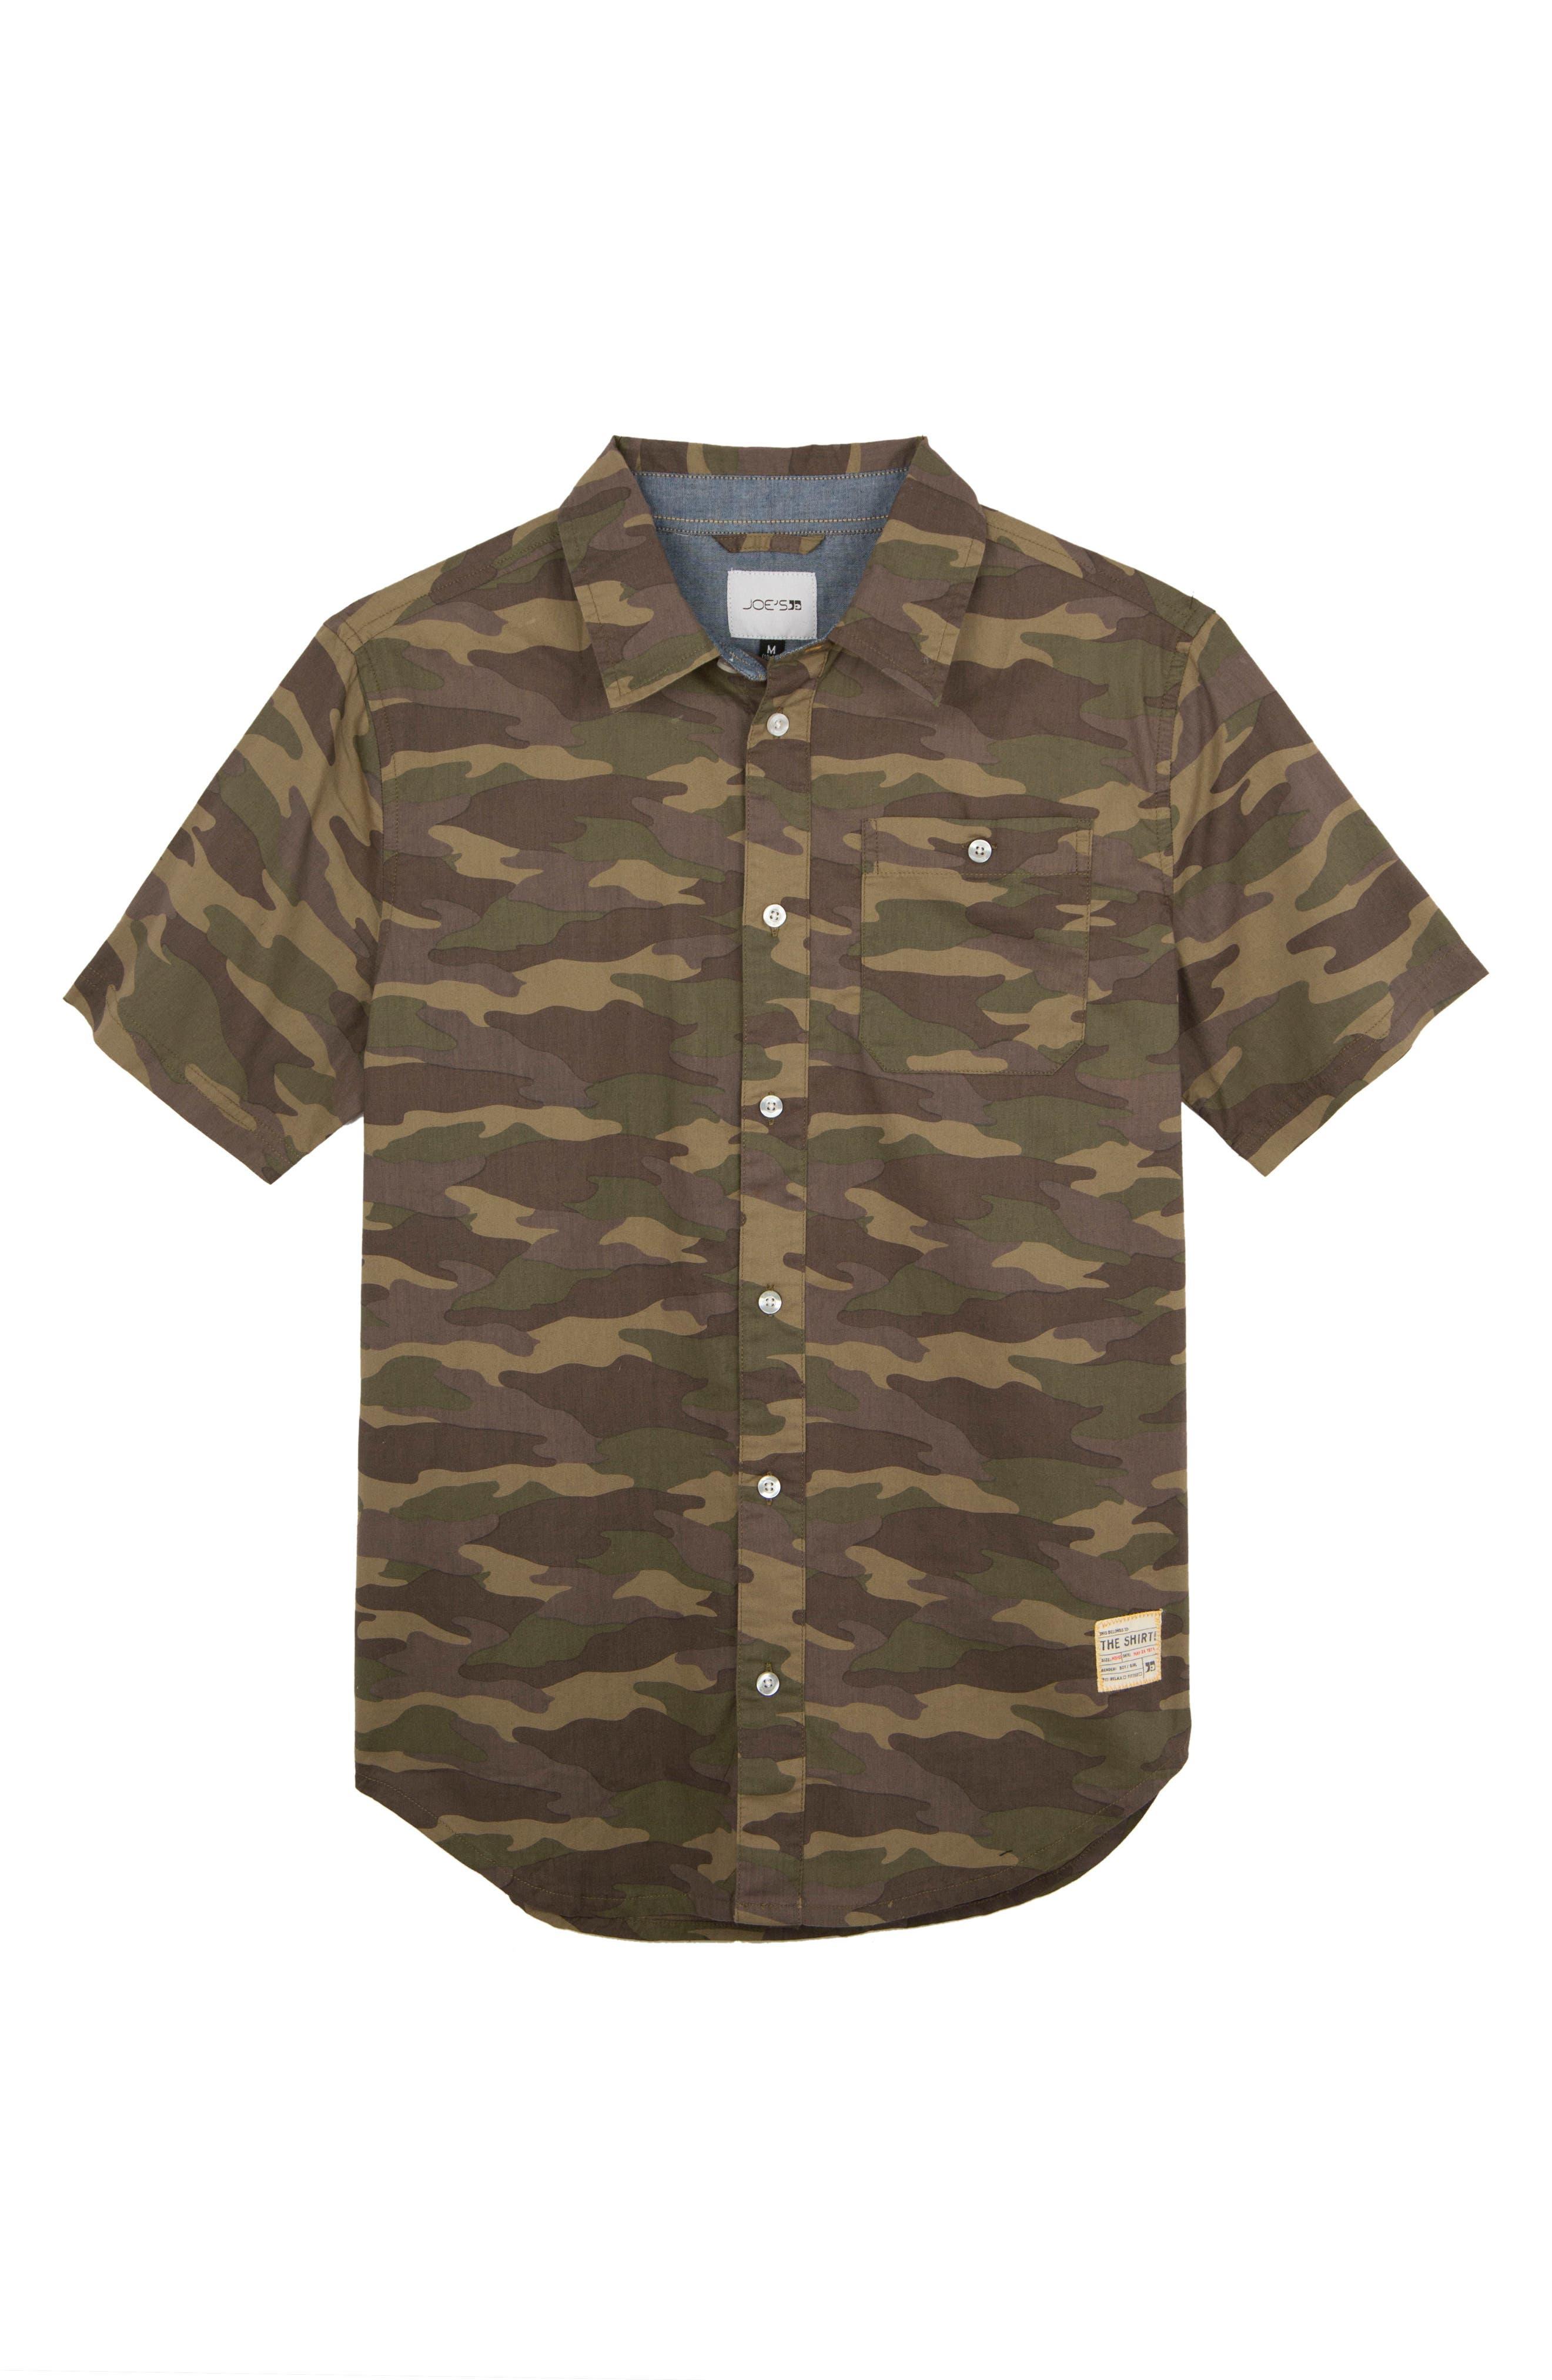 Alternate Image 1 Selected - Joe's Aiden Camo Print Shirt (Big Boys)